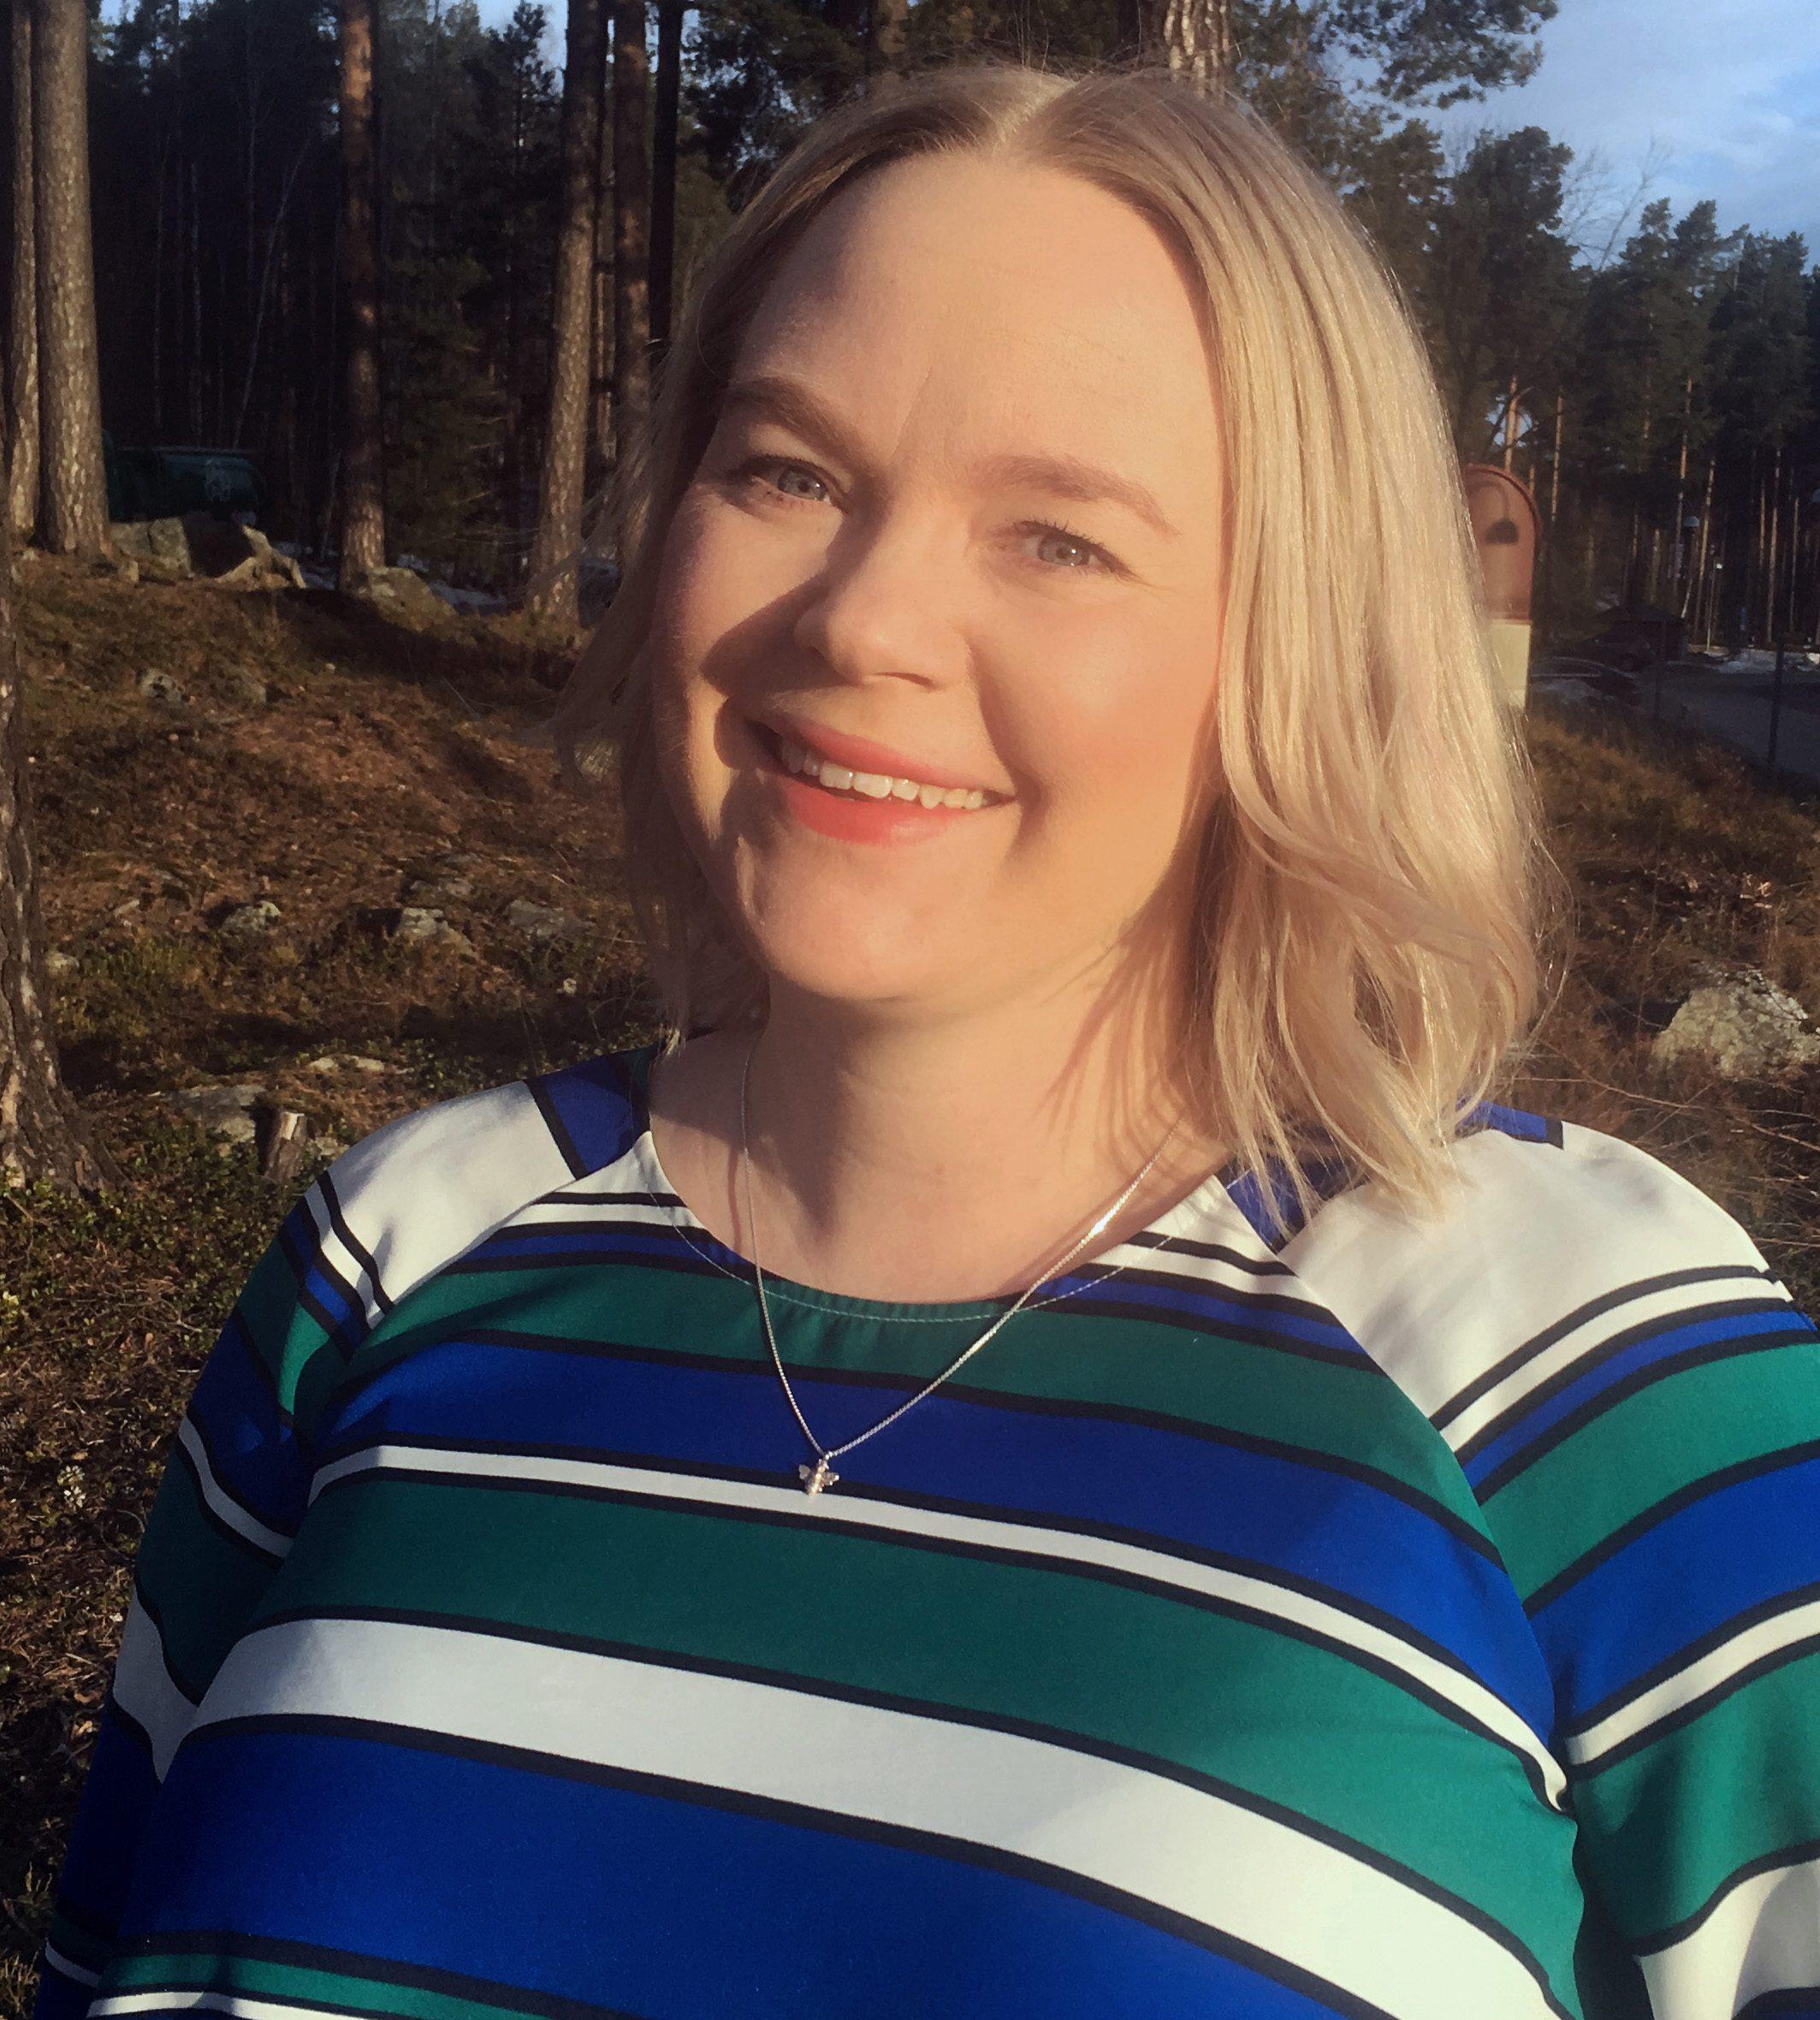 Nathalie Carlryd ny verksamhetschef